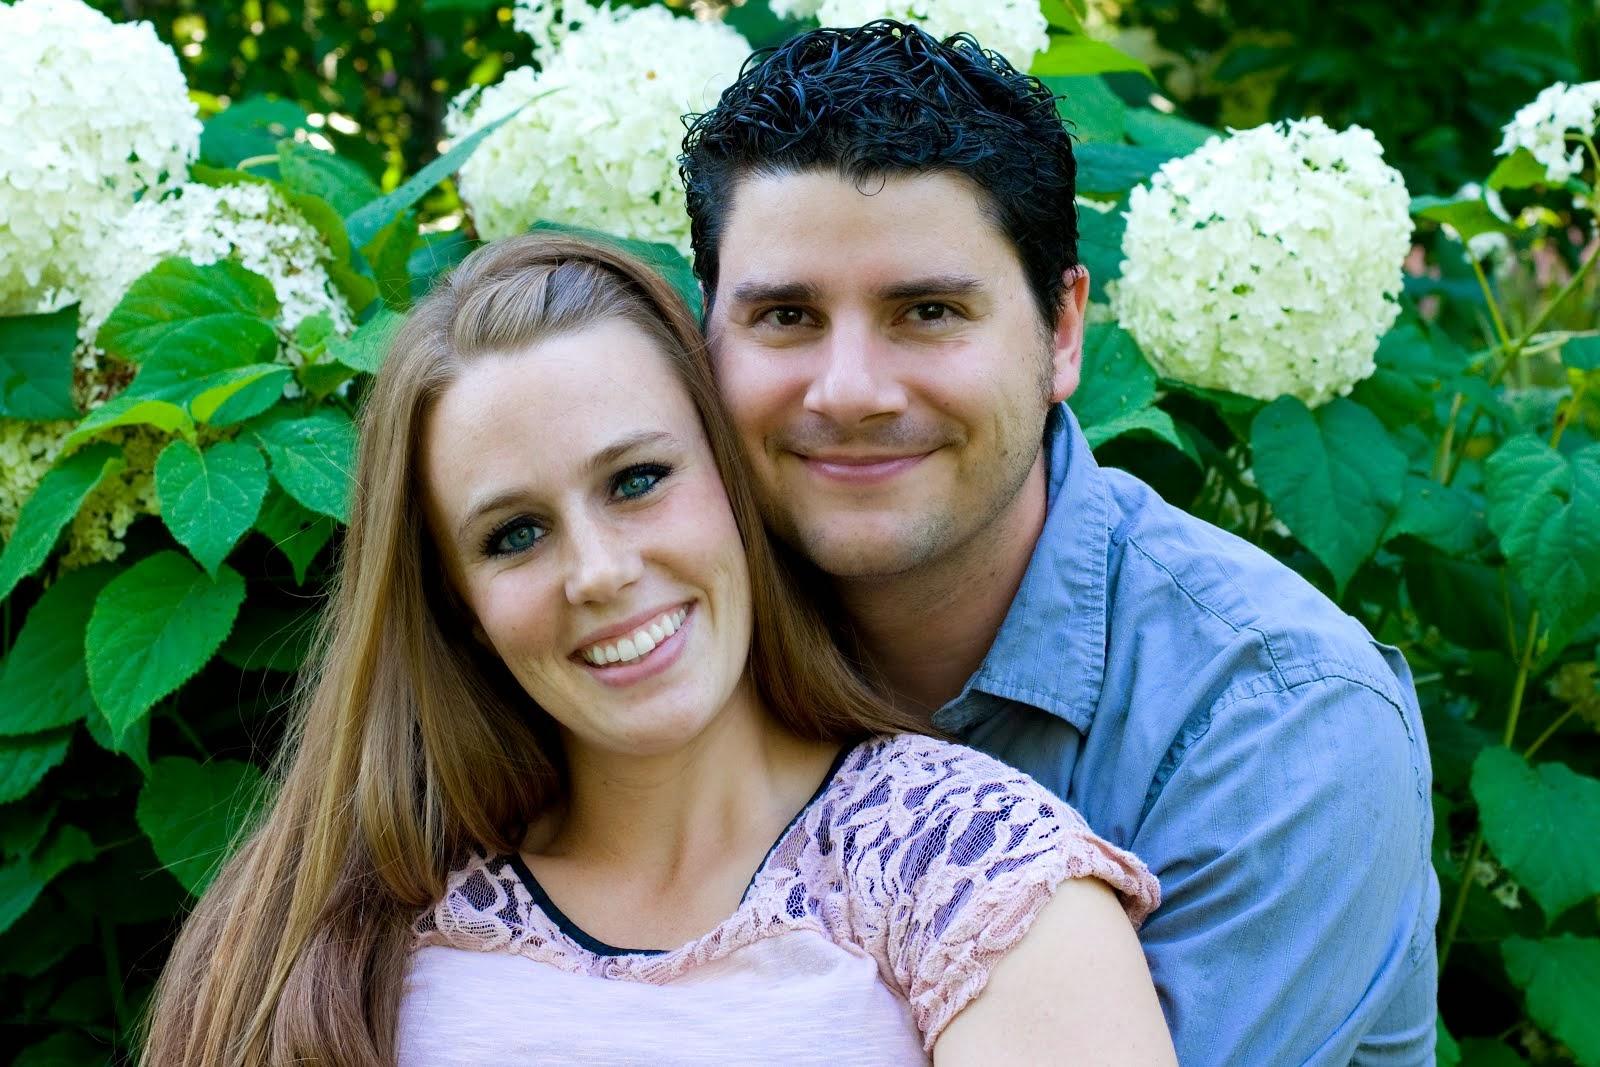 Richard and Kelli